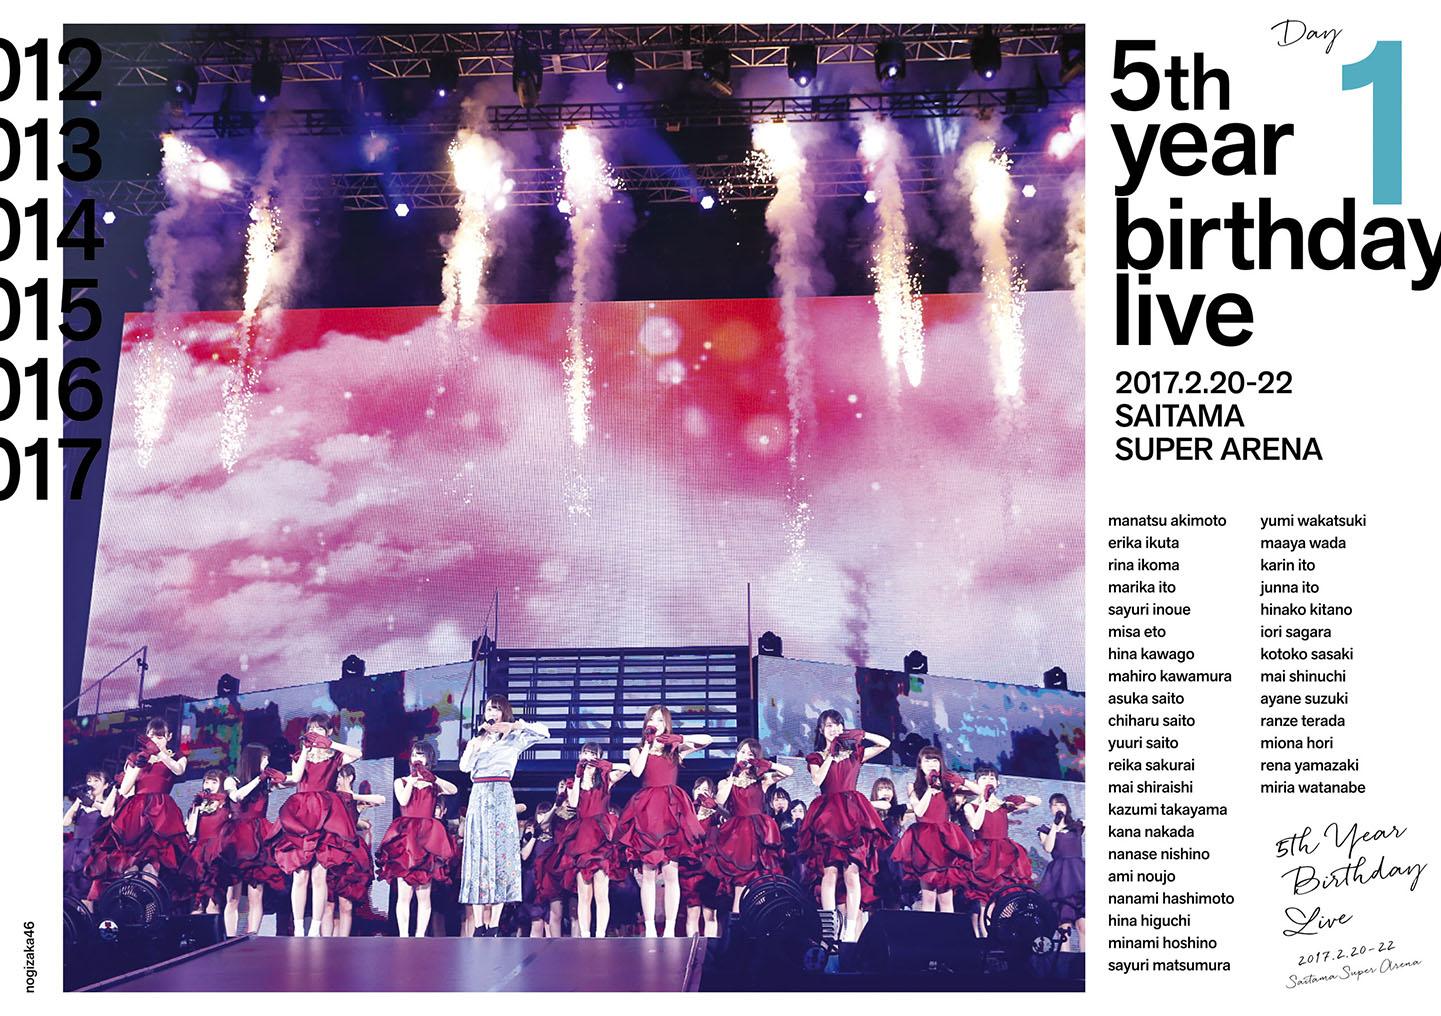 5th YEAR BIRTHDAY LIVE 2017.2.20-22 SAITAMA SUPER ARENA DAY1 [ 乃木坂46 ]